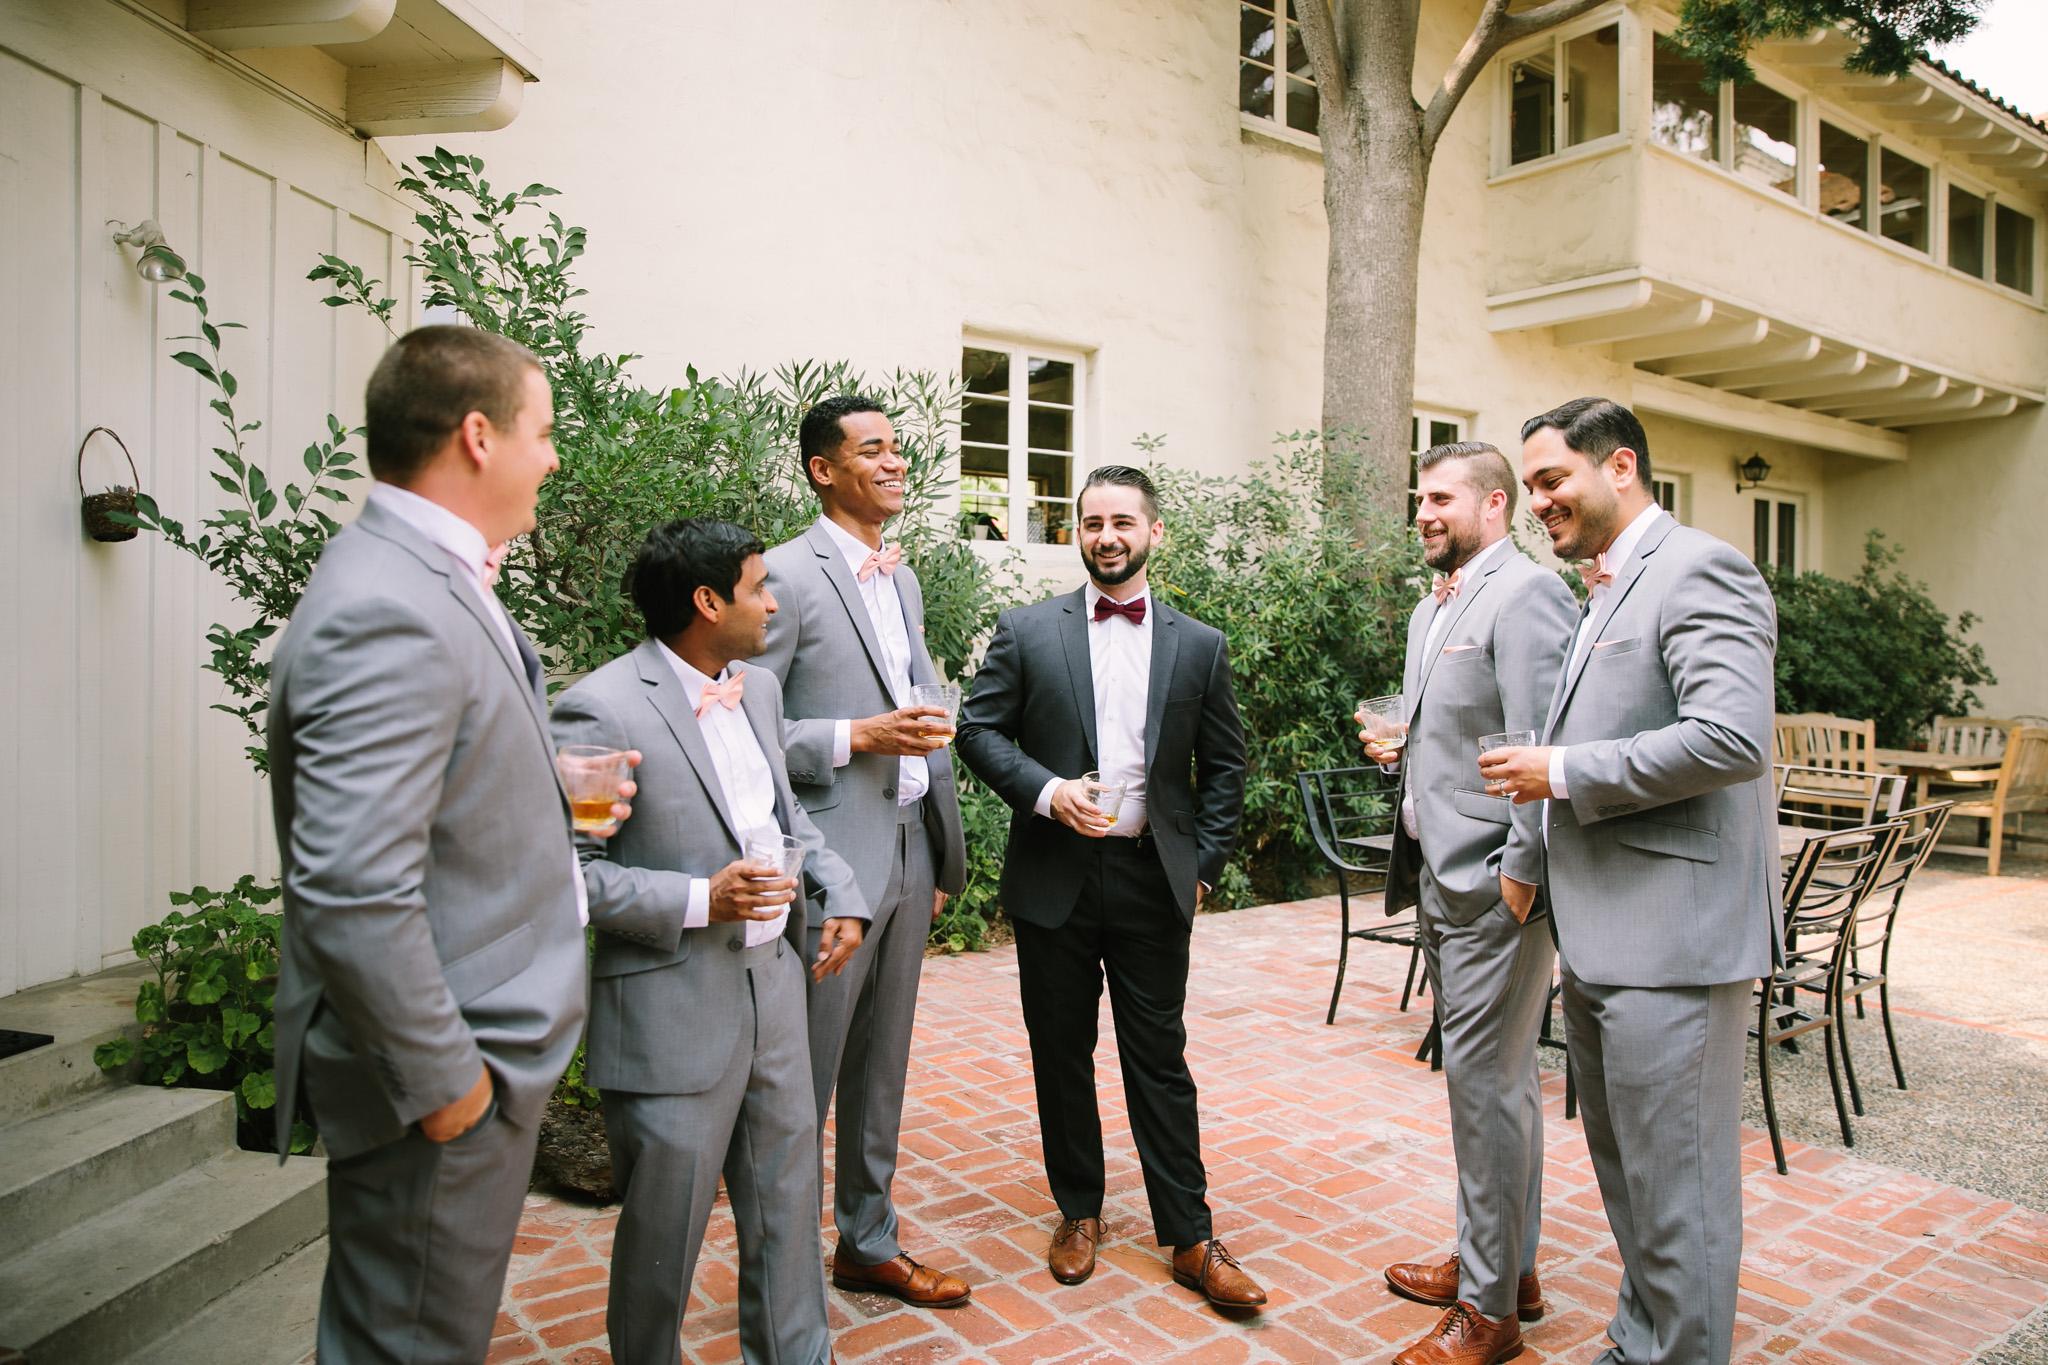 0149-LJ-The-Ruby-Street-Los-Angeles-County-Wedding-Photography.jpg